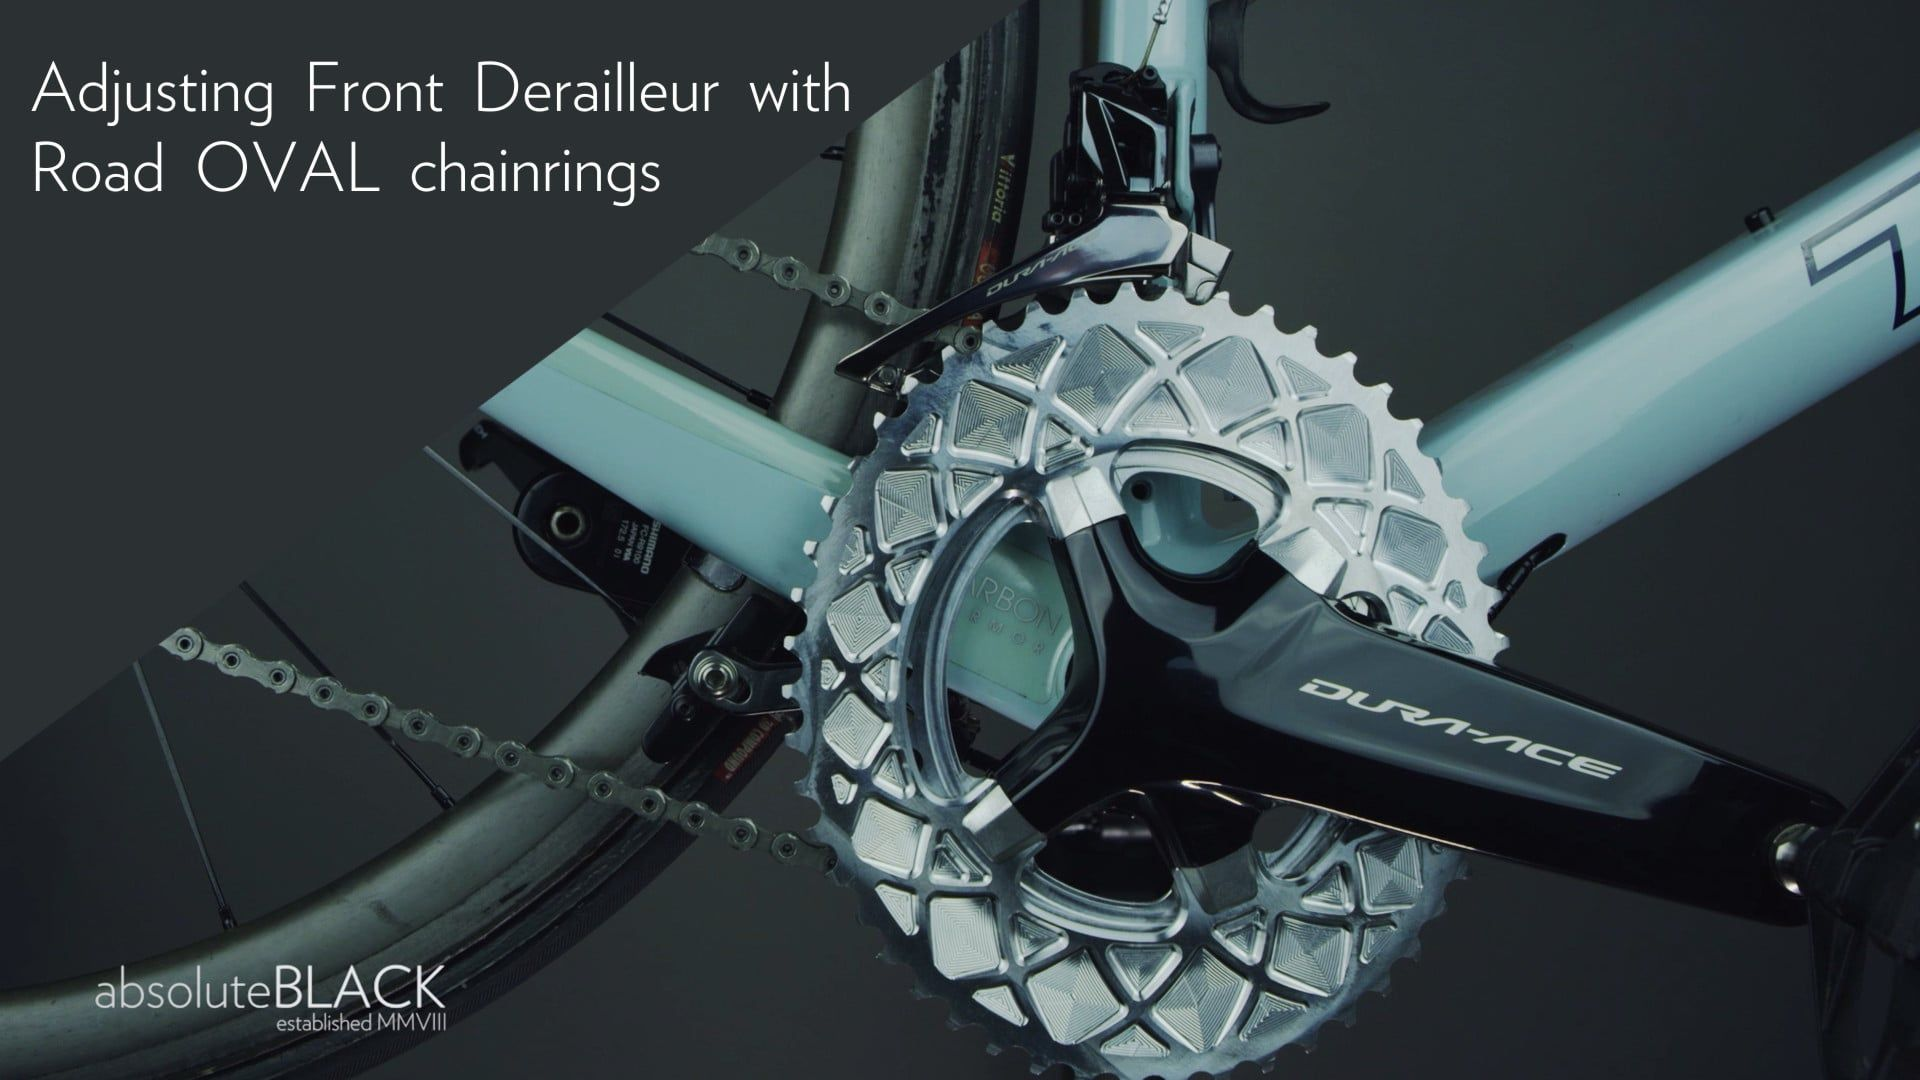 Premium Oval Rings For Da9100 Ultegra 8000 Derailleur